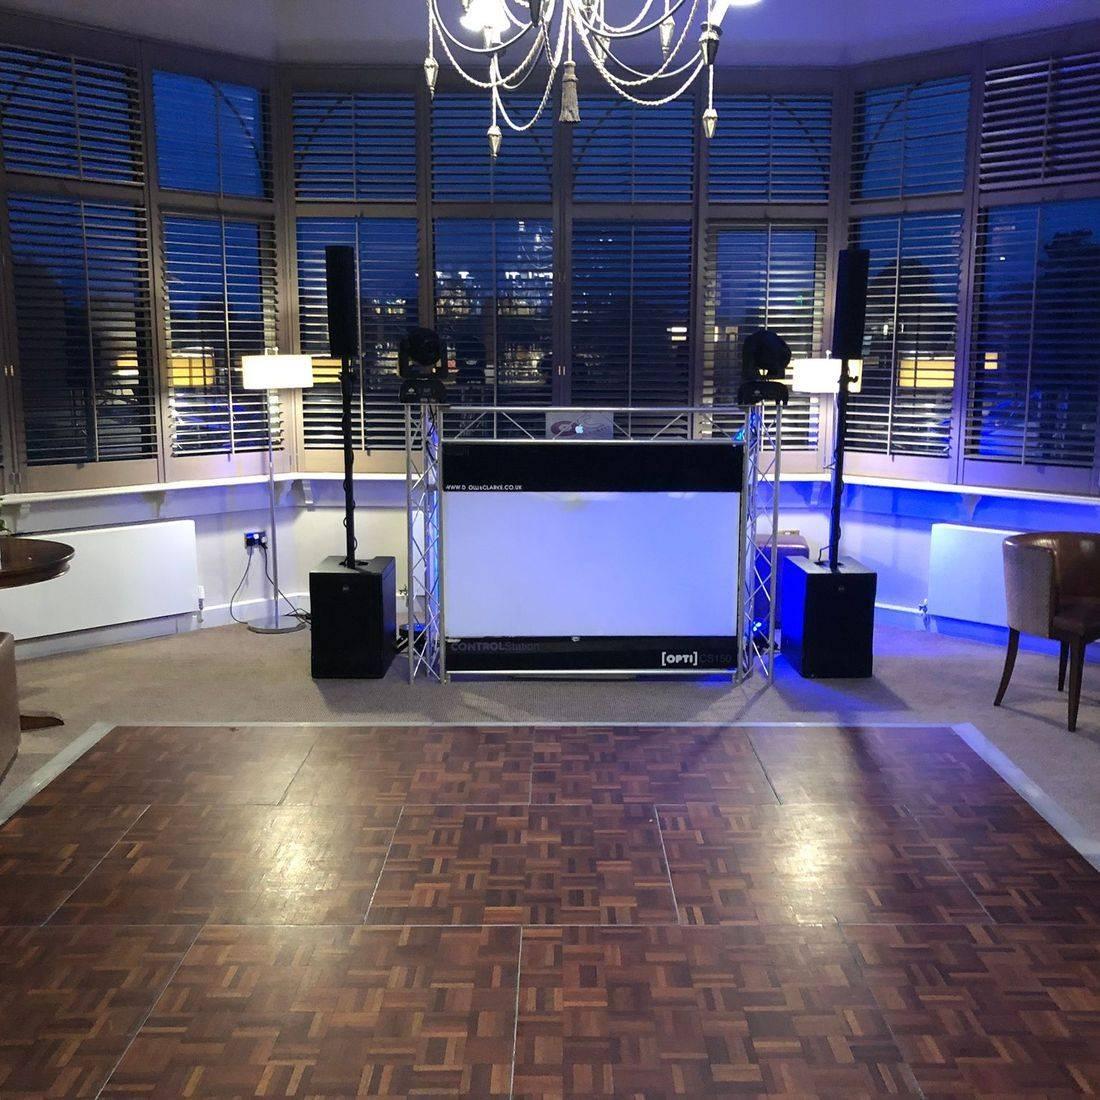 The Brockencote Hall wedding venue